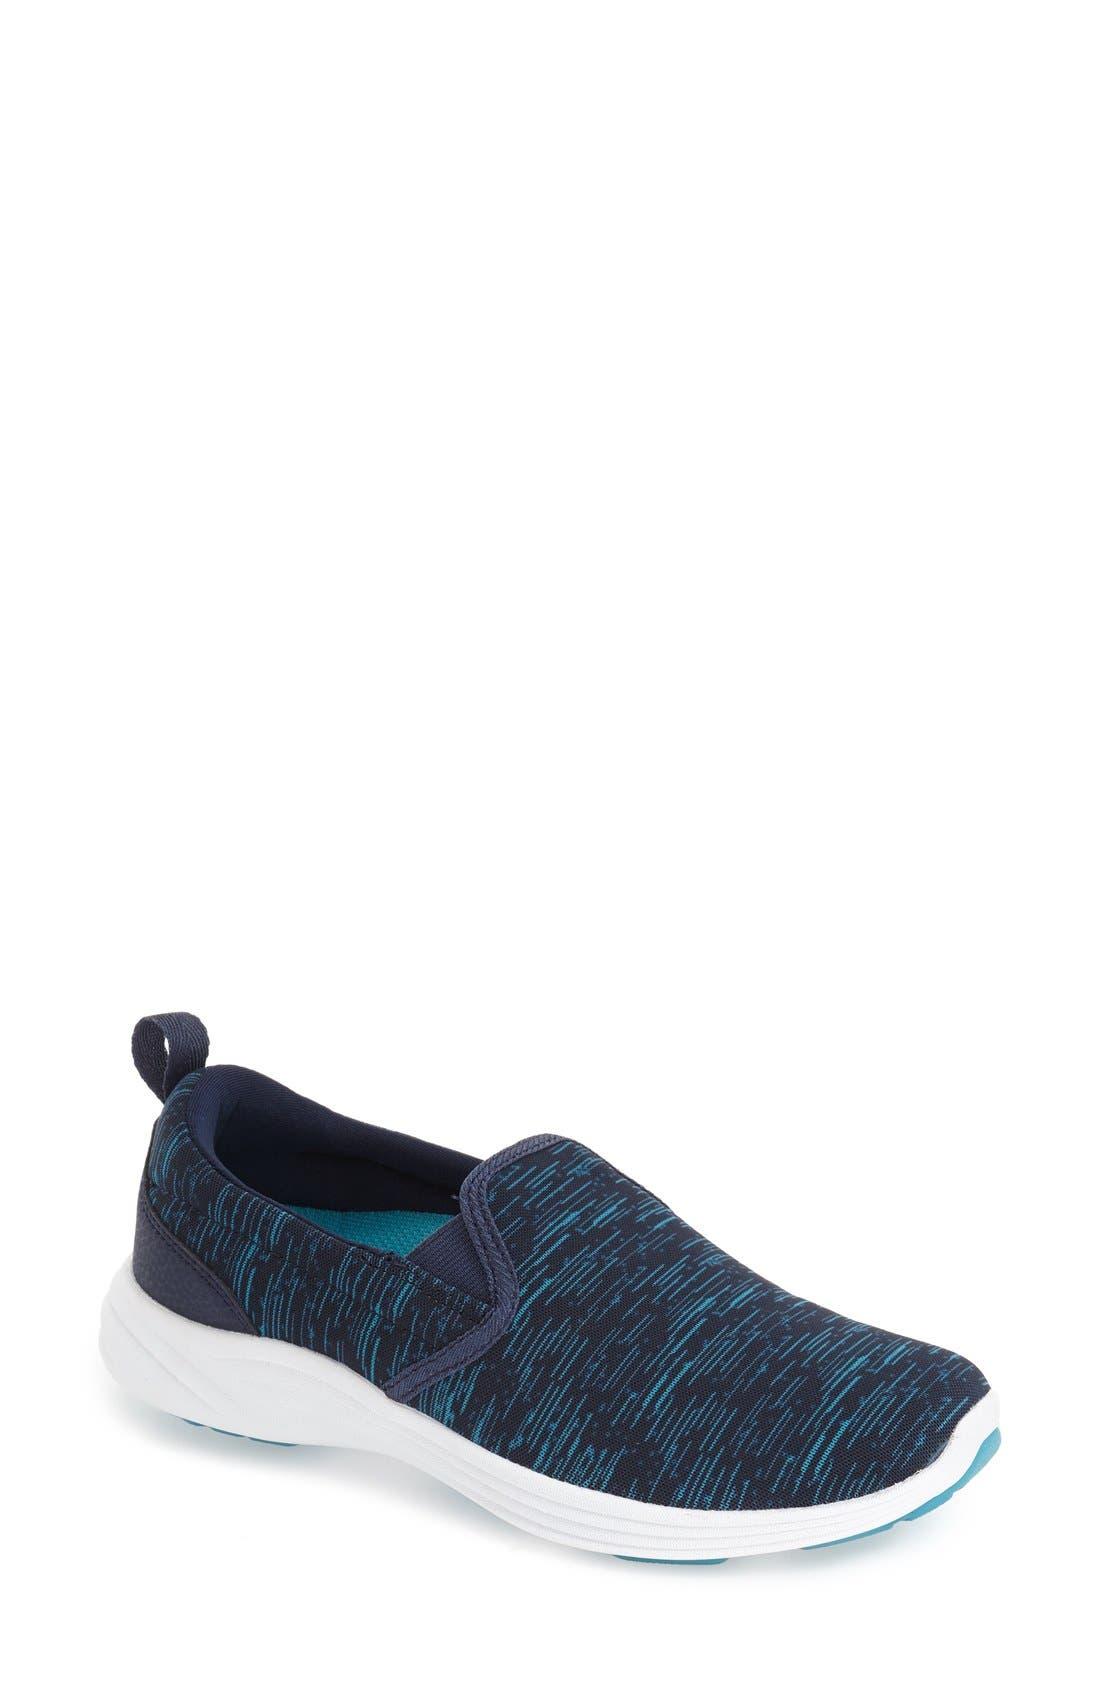 Alternate Image 1 Selected - Vionic 'Kea' Slip-On Sneaker (Women)